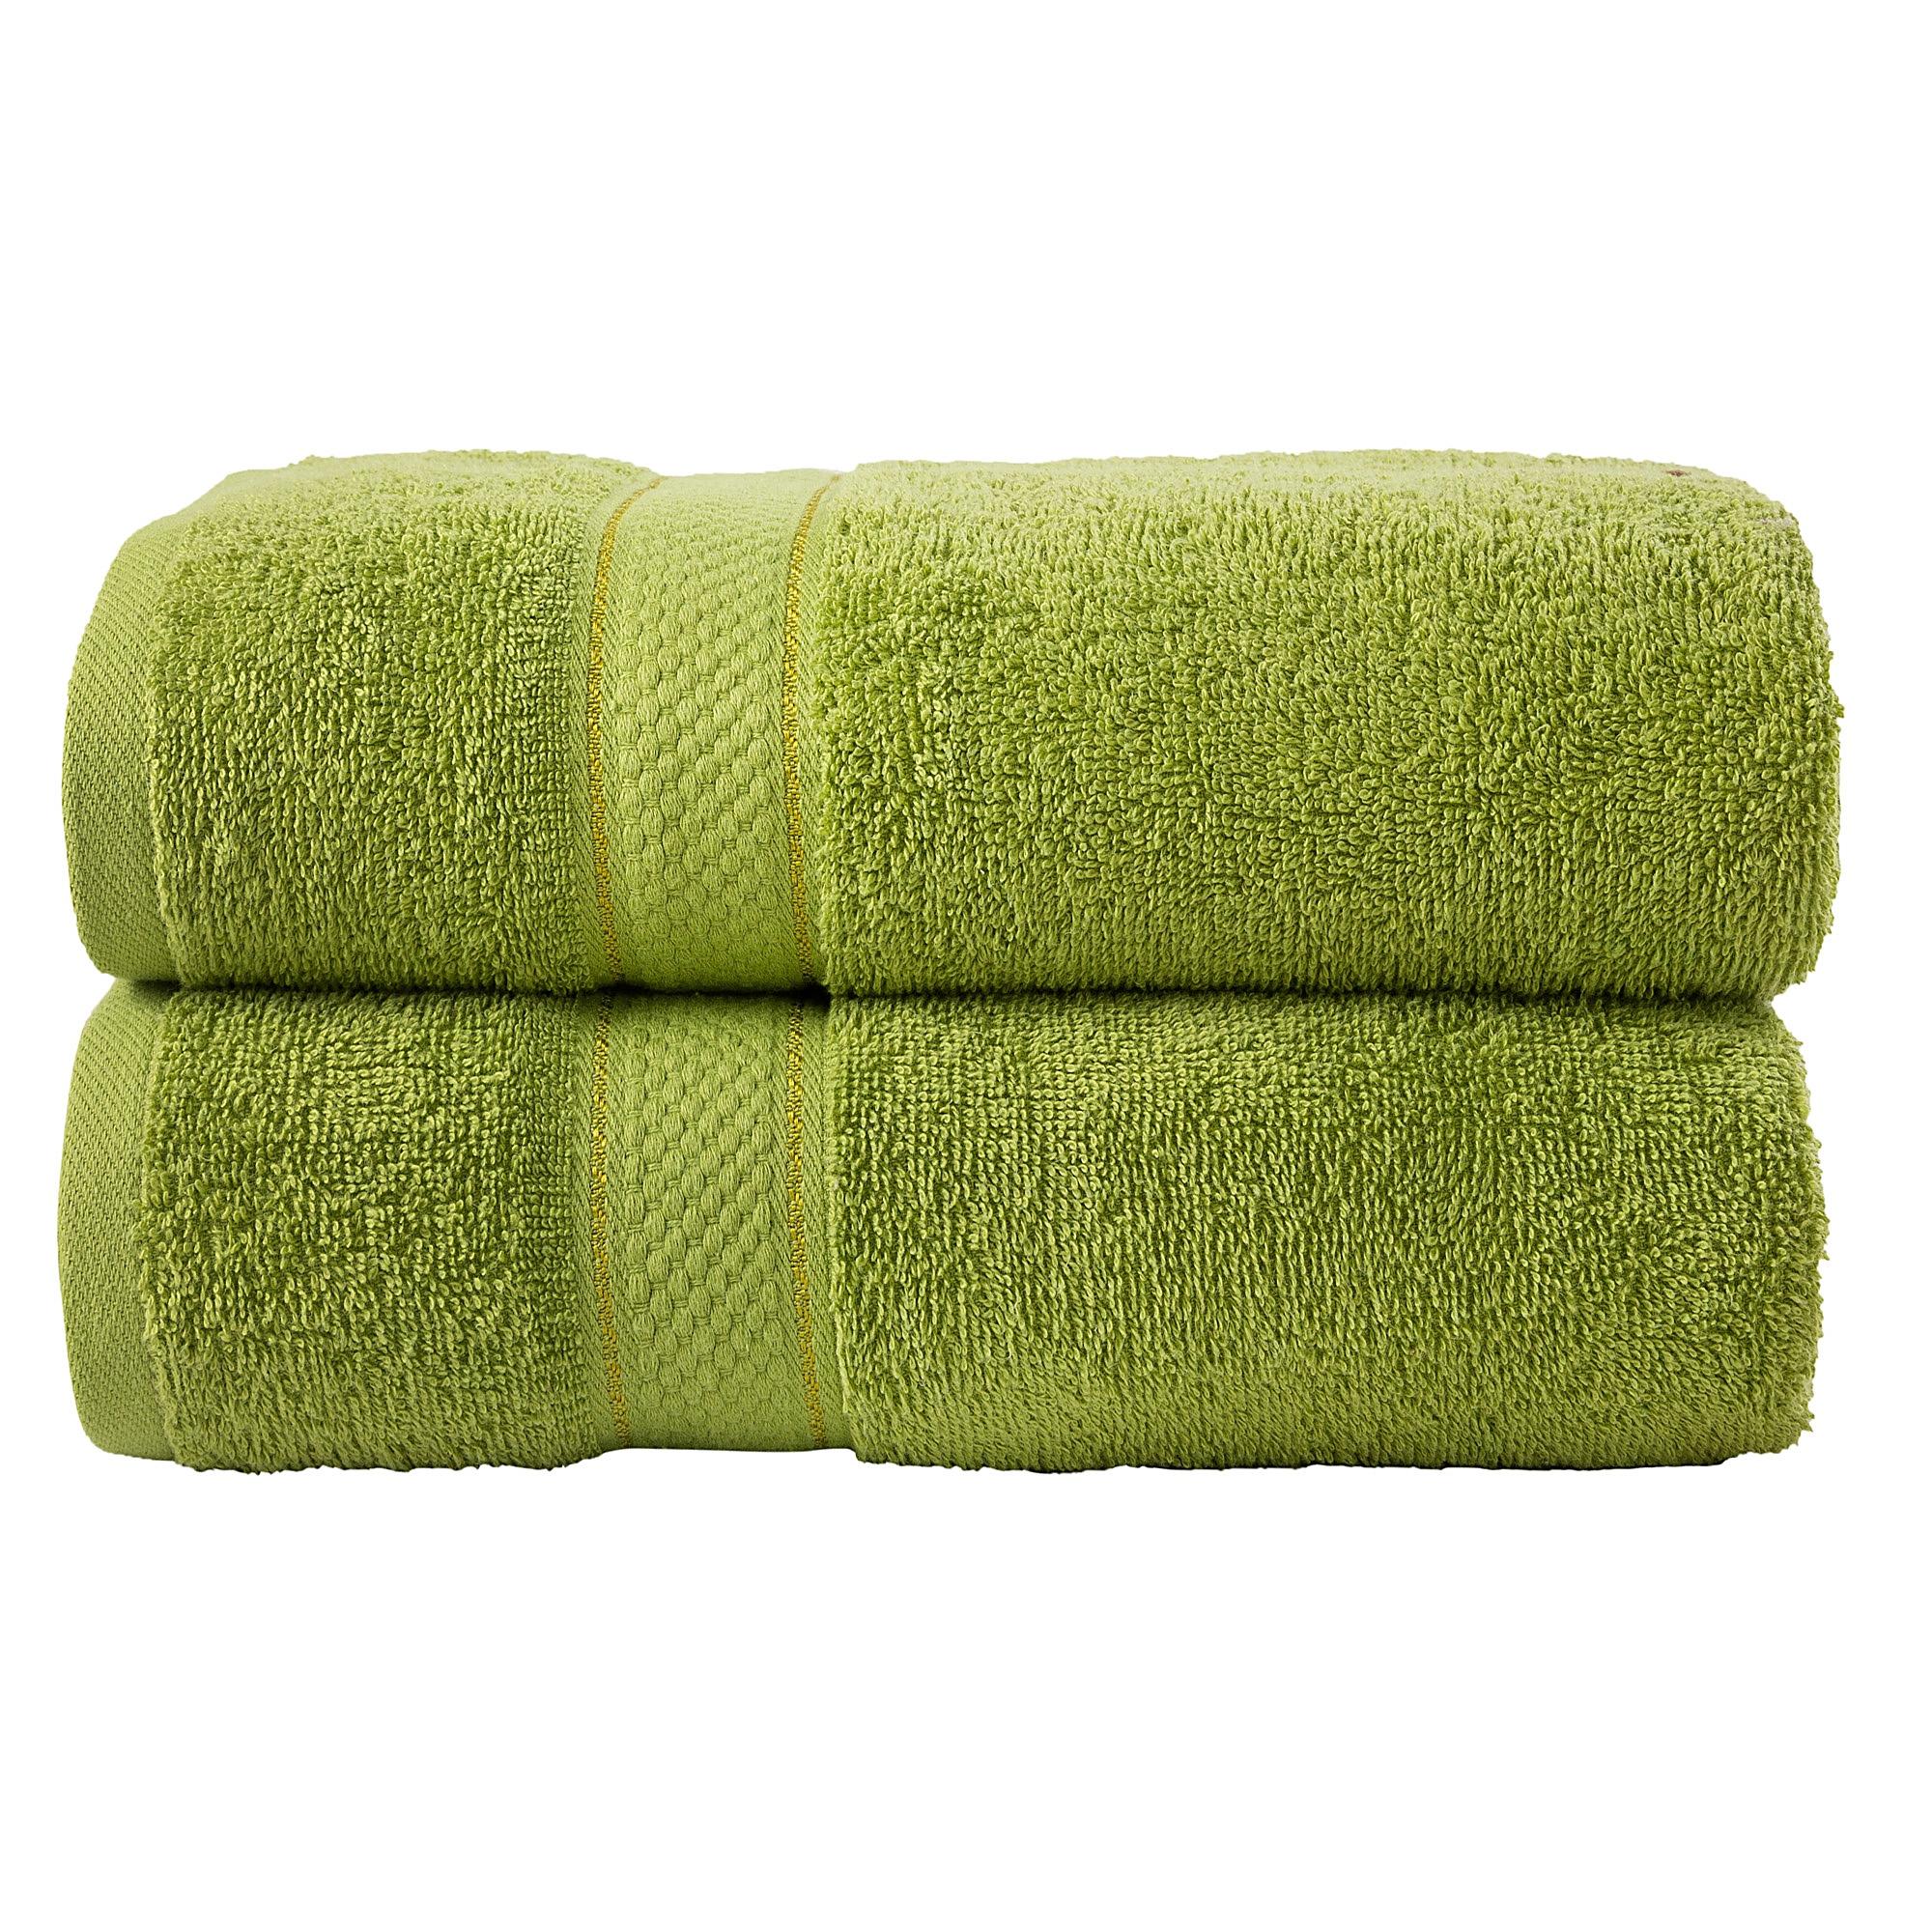 Bale Set 2pcs Olive Plain Extra Large Bath Sheet Towel